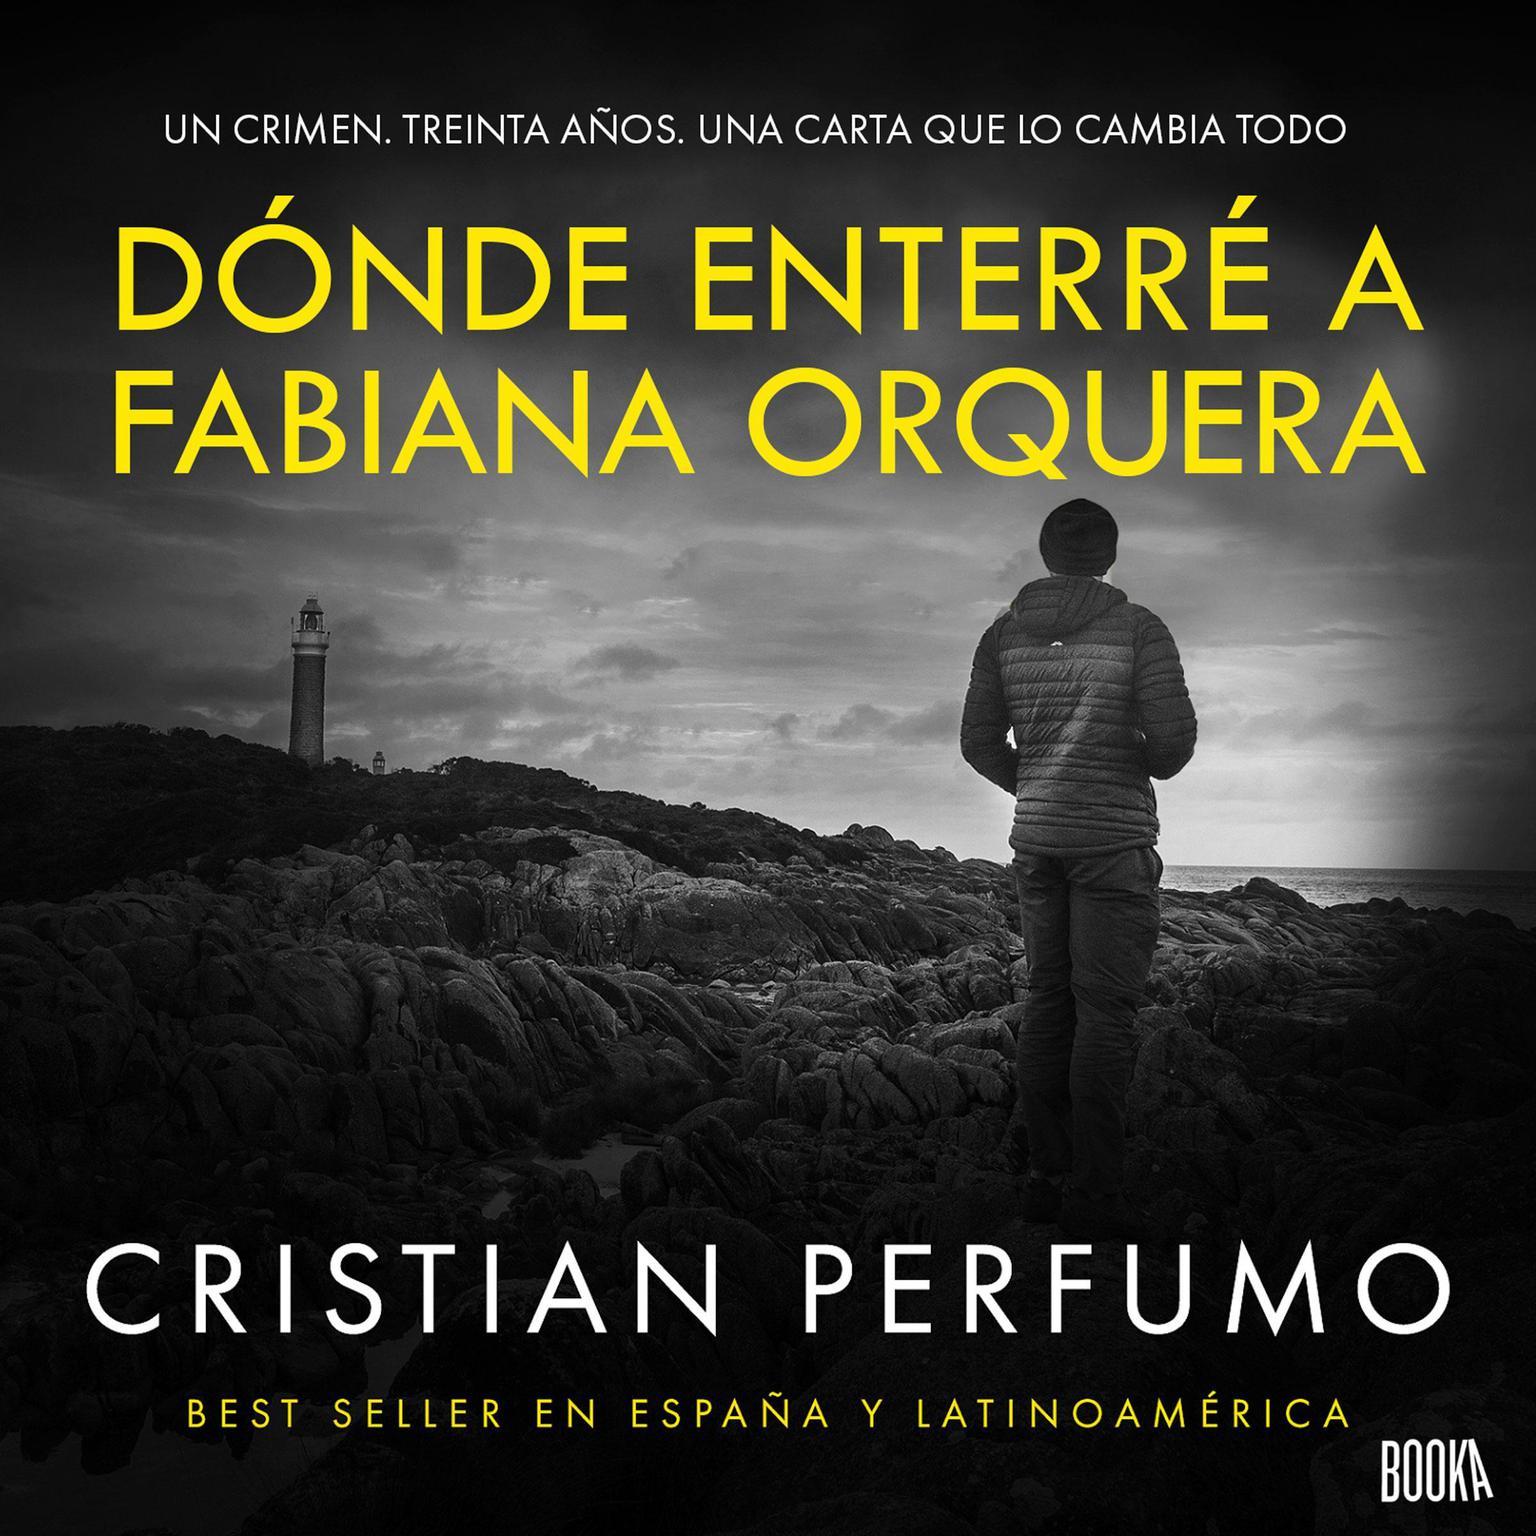 Donde enterre a Fabiana Orquera: Novela de misterio en la Patagonia Audiobook, by Cristian Perfumo